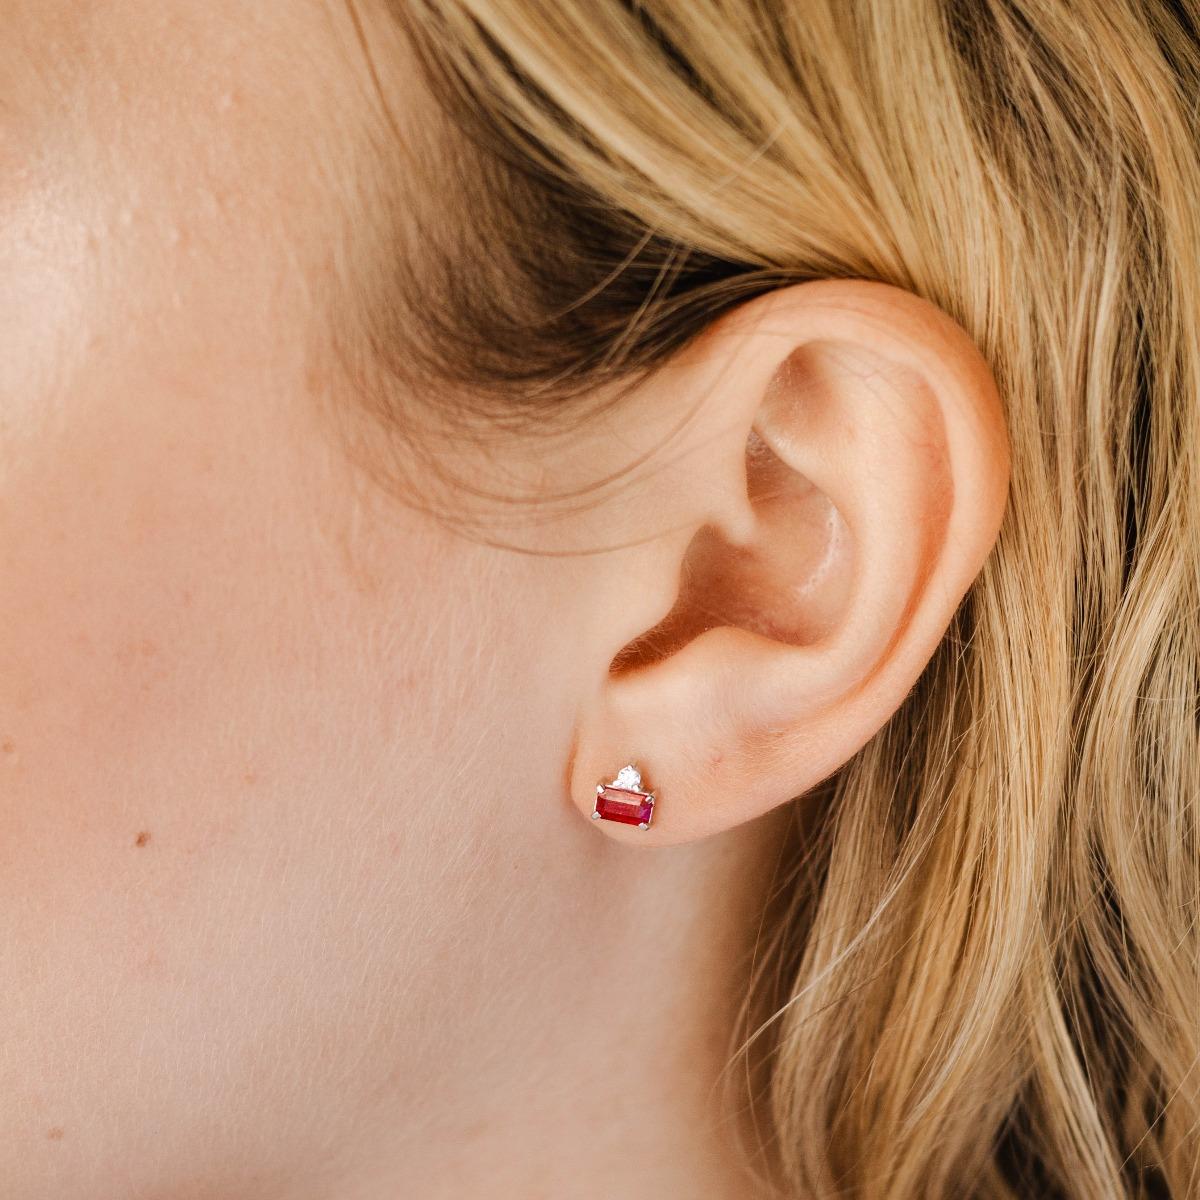 Burma Ruby Diamond Earrings Studs 14K White Gold